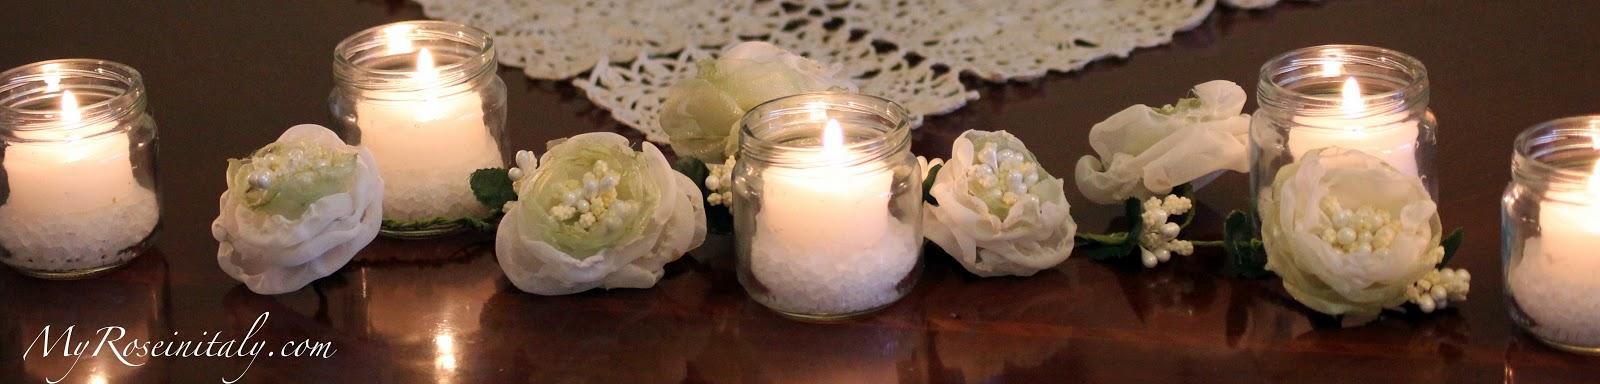 My roseinitaly un centrotavola improvvisato - Centro tavola con candele ...